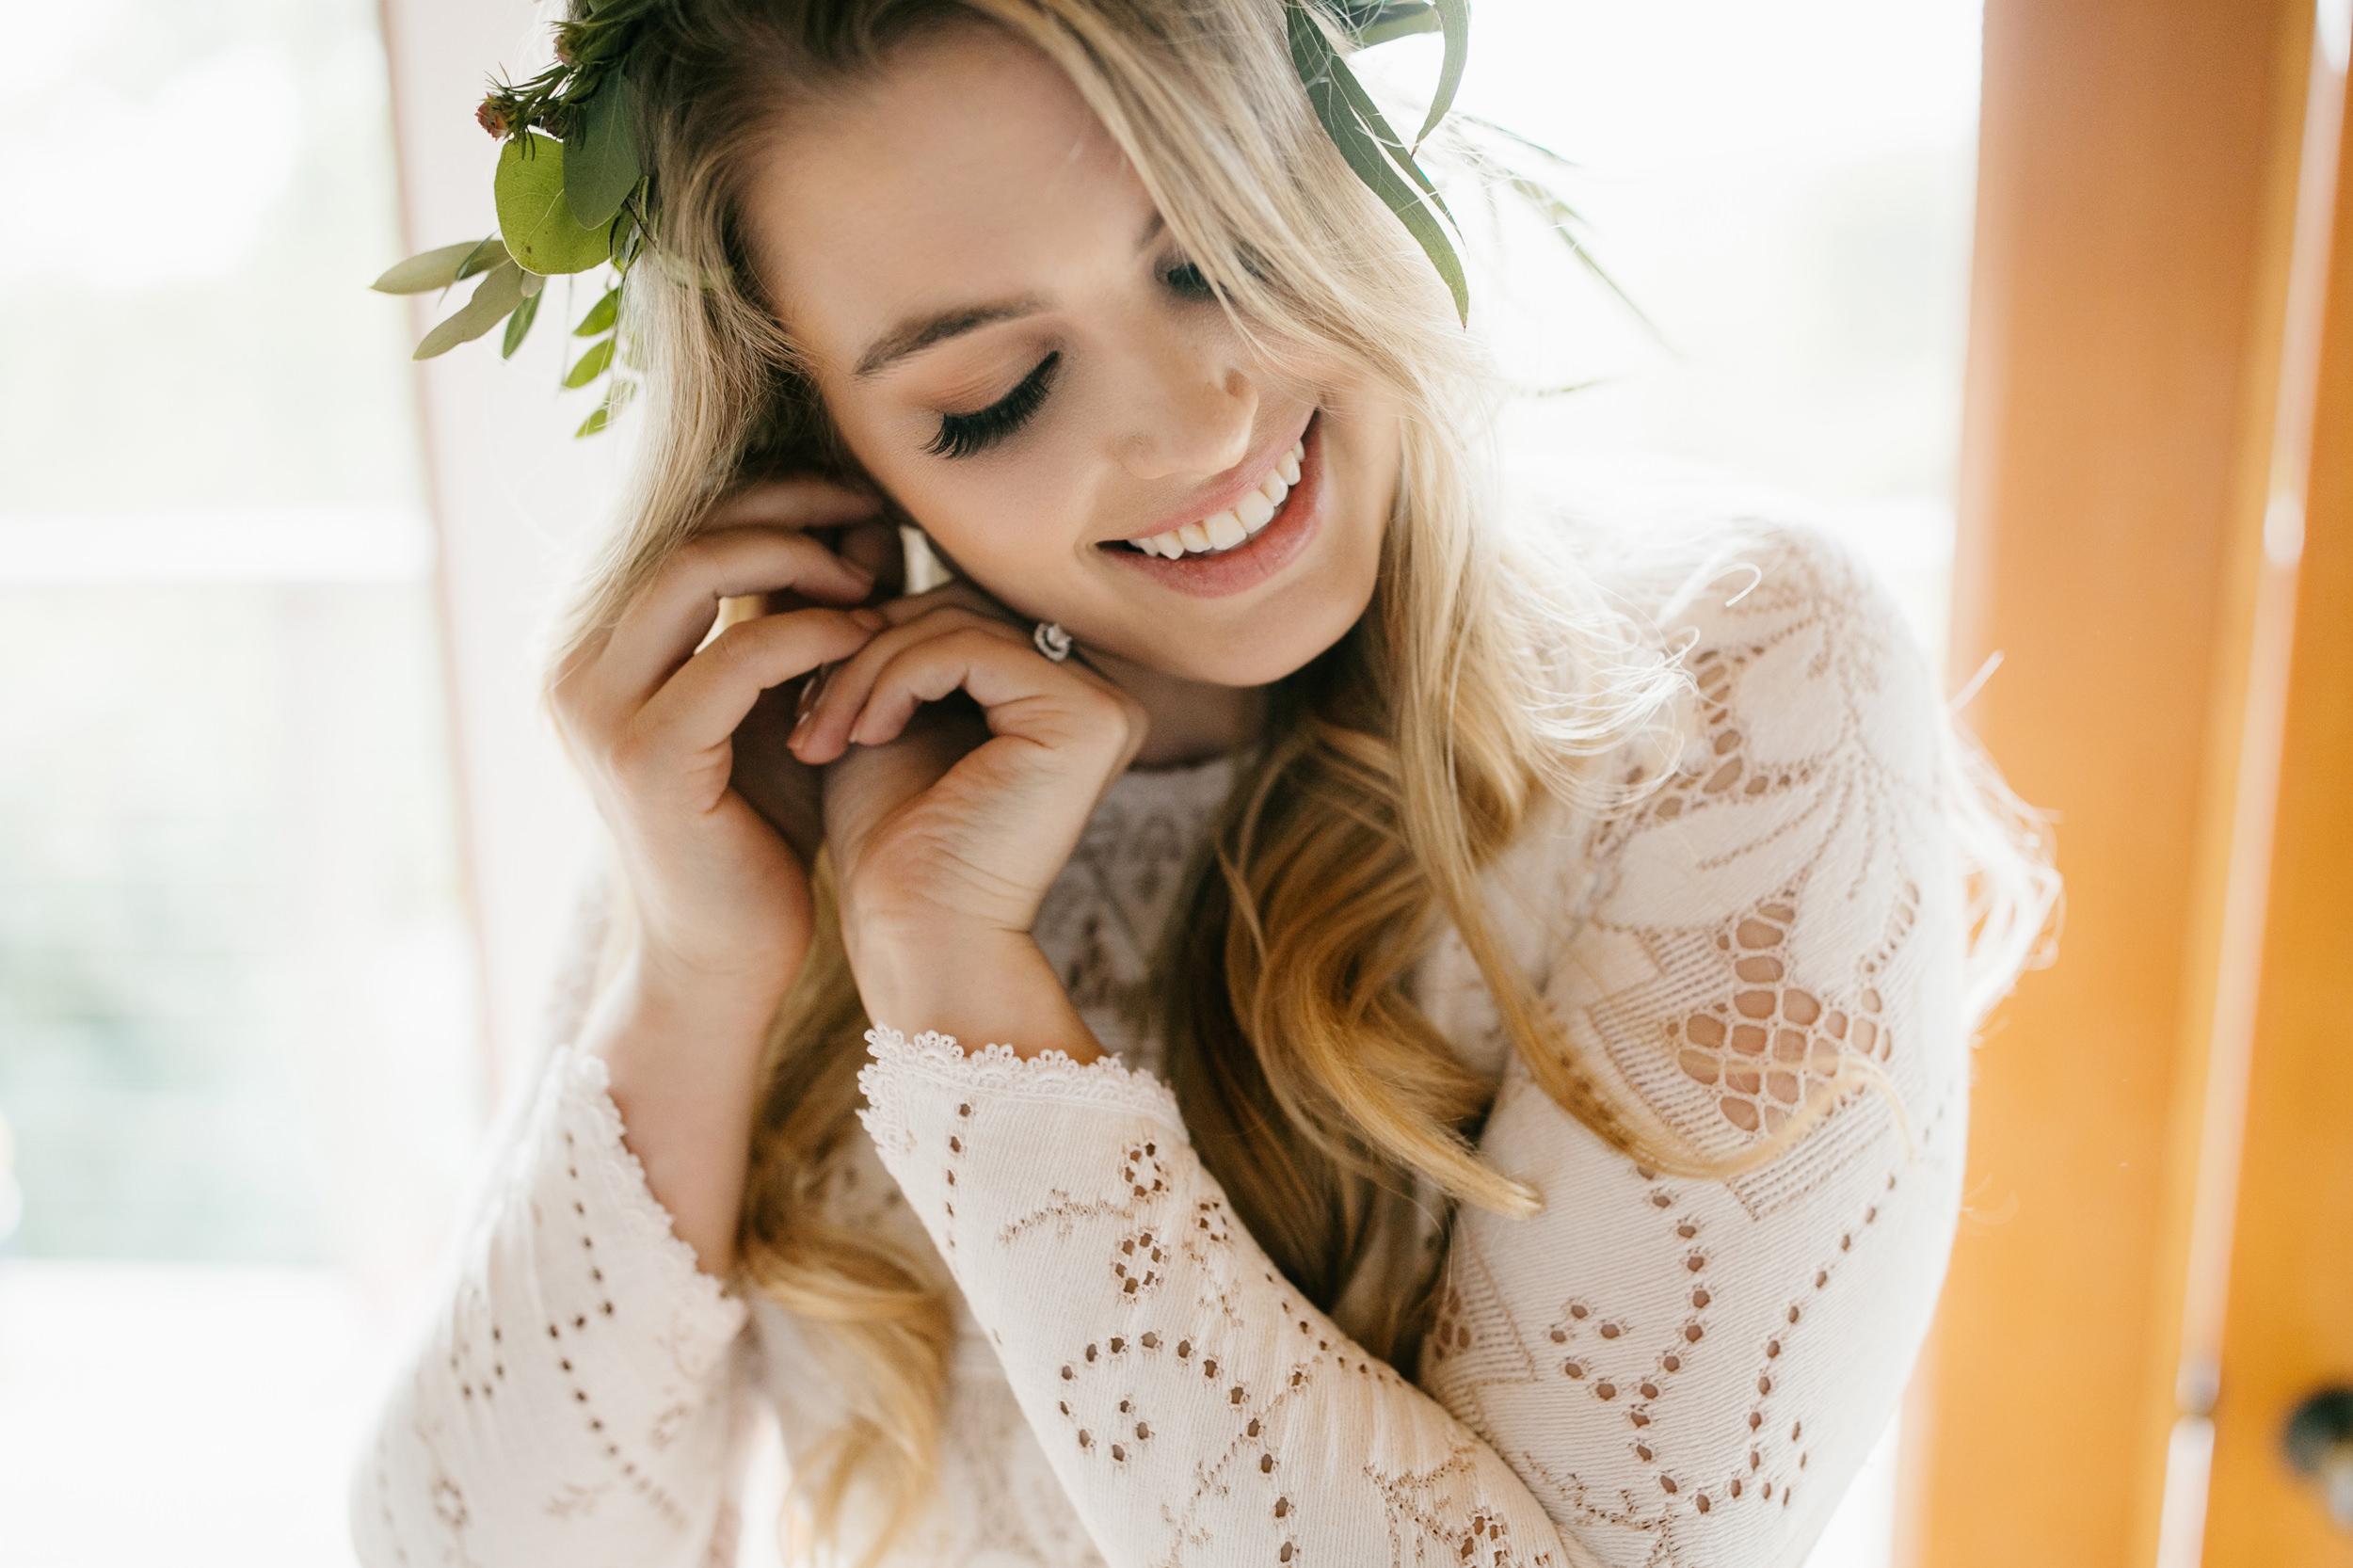 big-sur-elopement-california-adventure-wedding-photographer 034.JPG